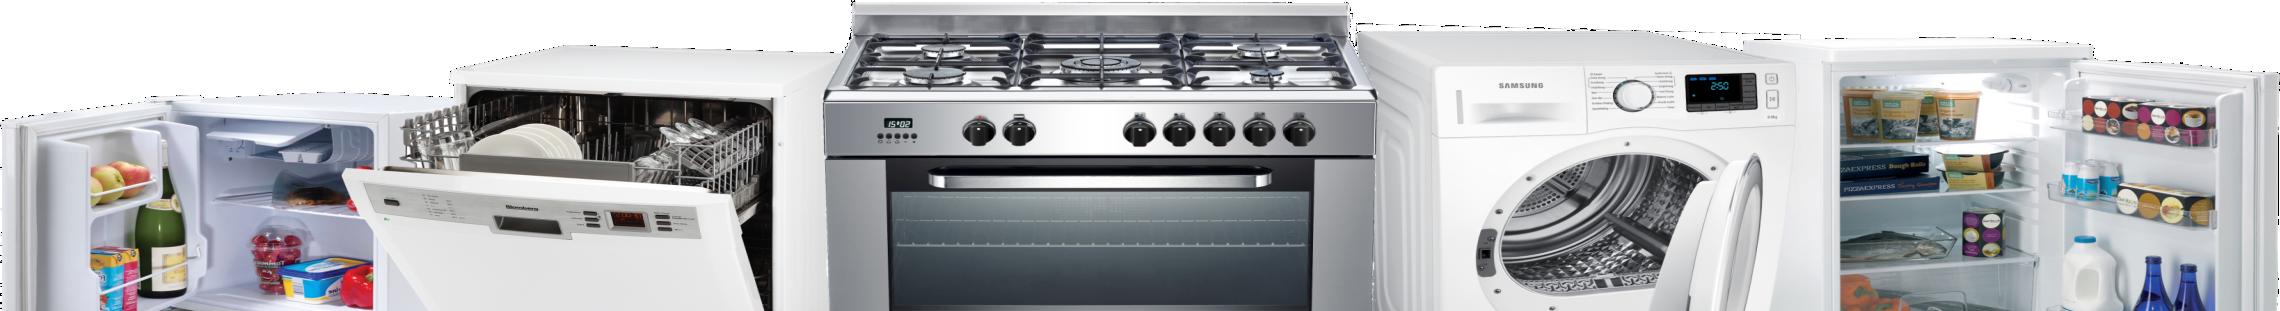 reparatie oven wasmachine vaatwasser